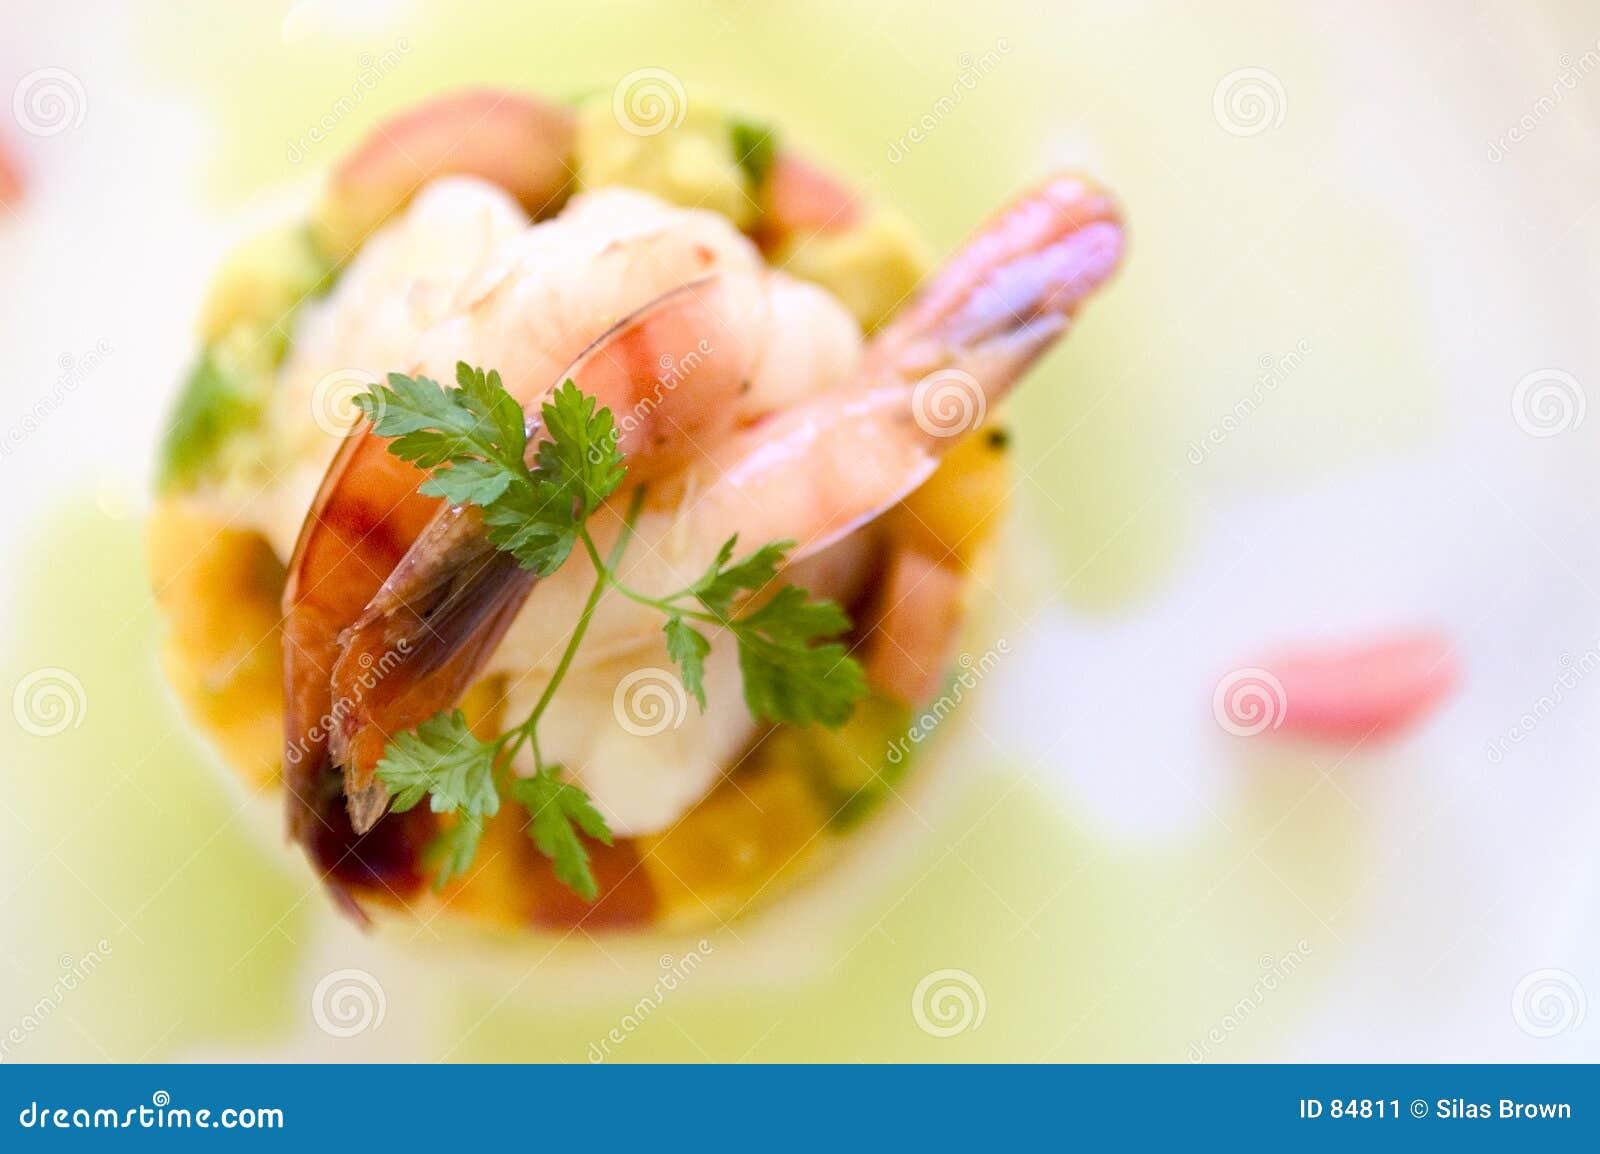 Food prawn dish